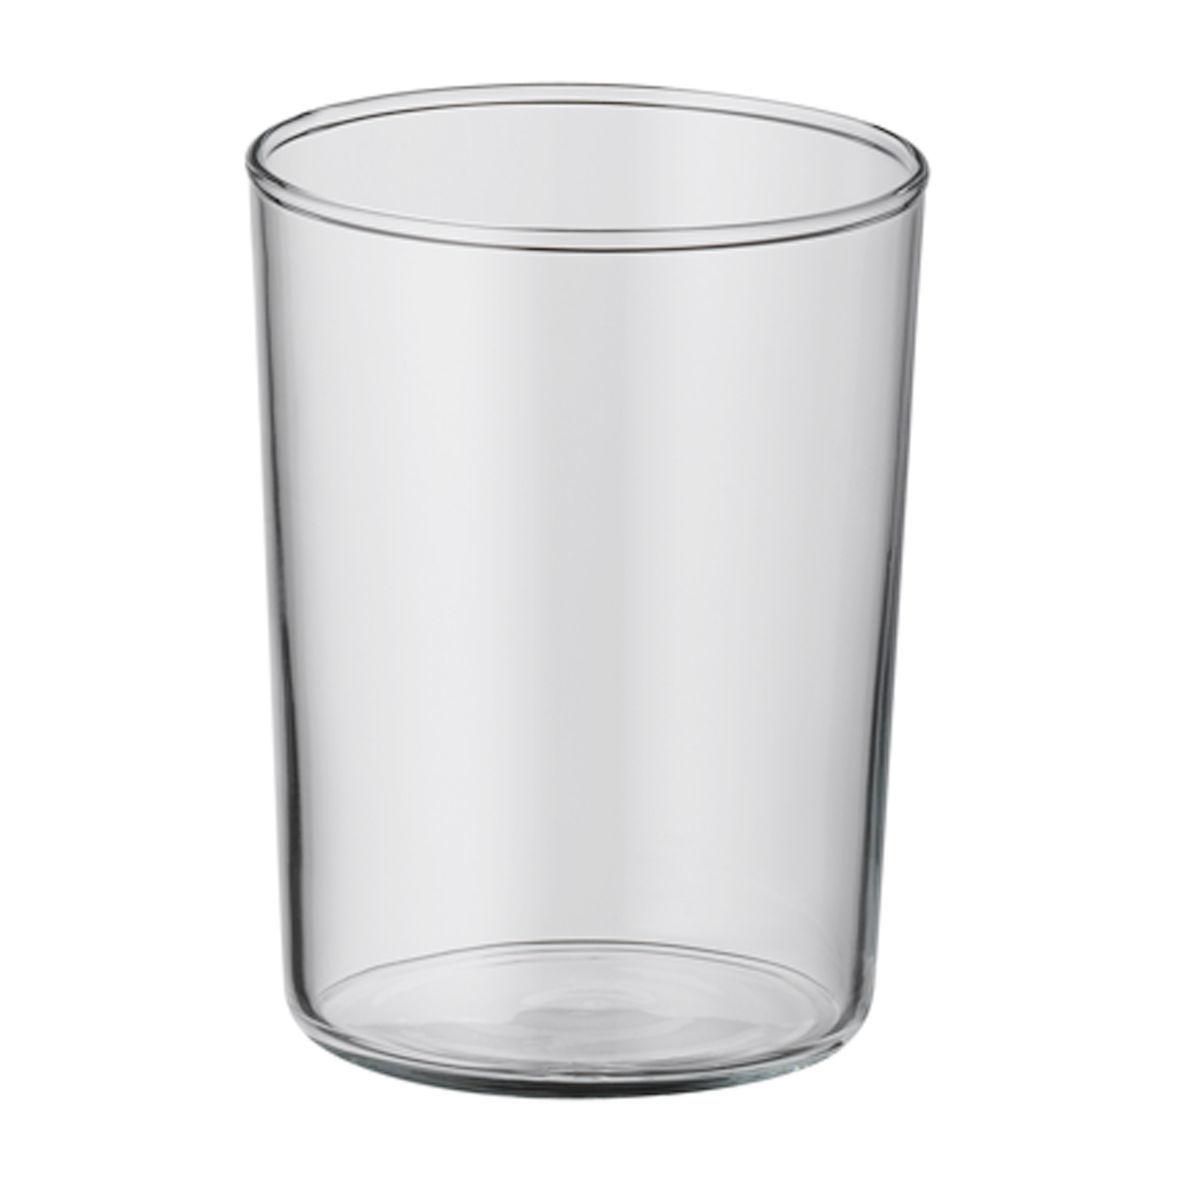 Стакан для подстаканника WMF COFFEE AND TEA, объем 0,2 л, прозрачный WMF 06 3609 5080 фото 1